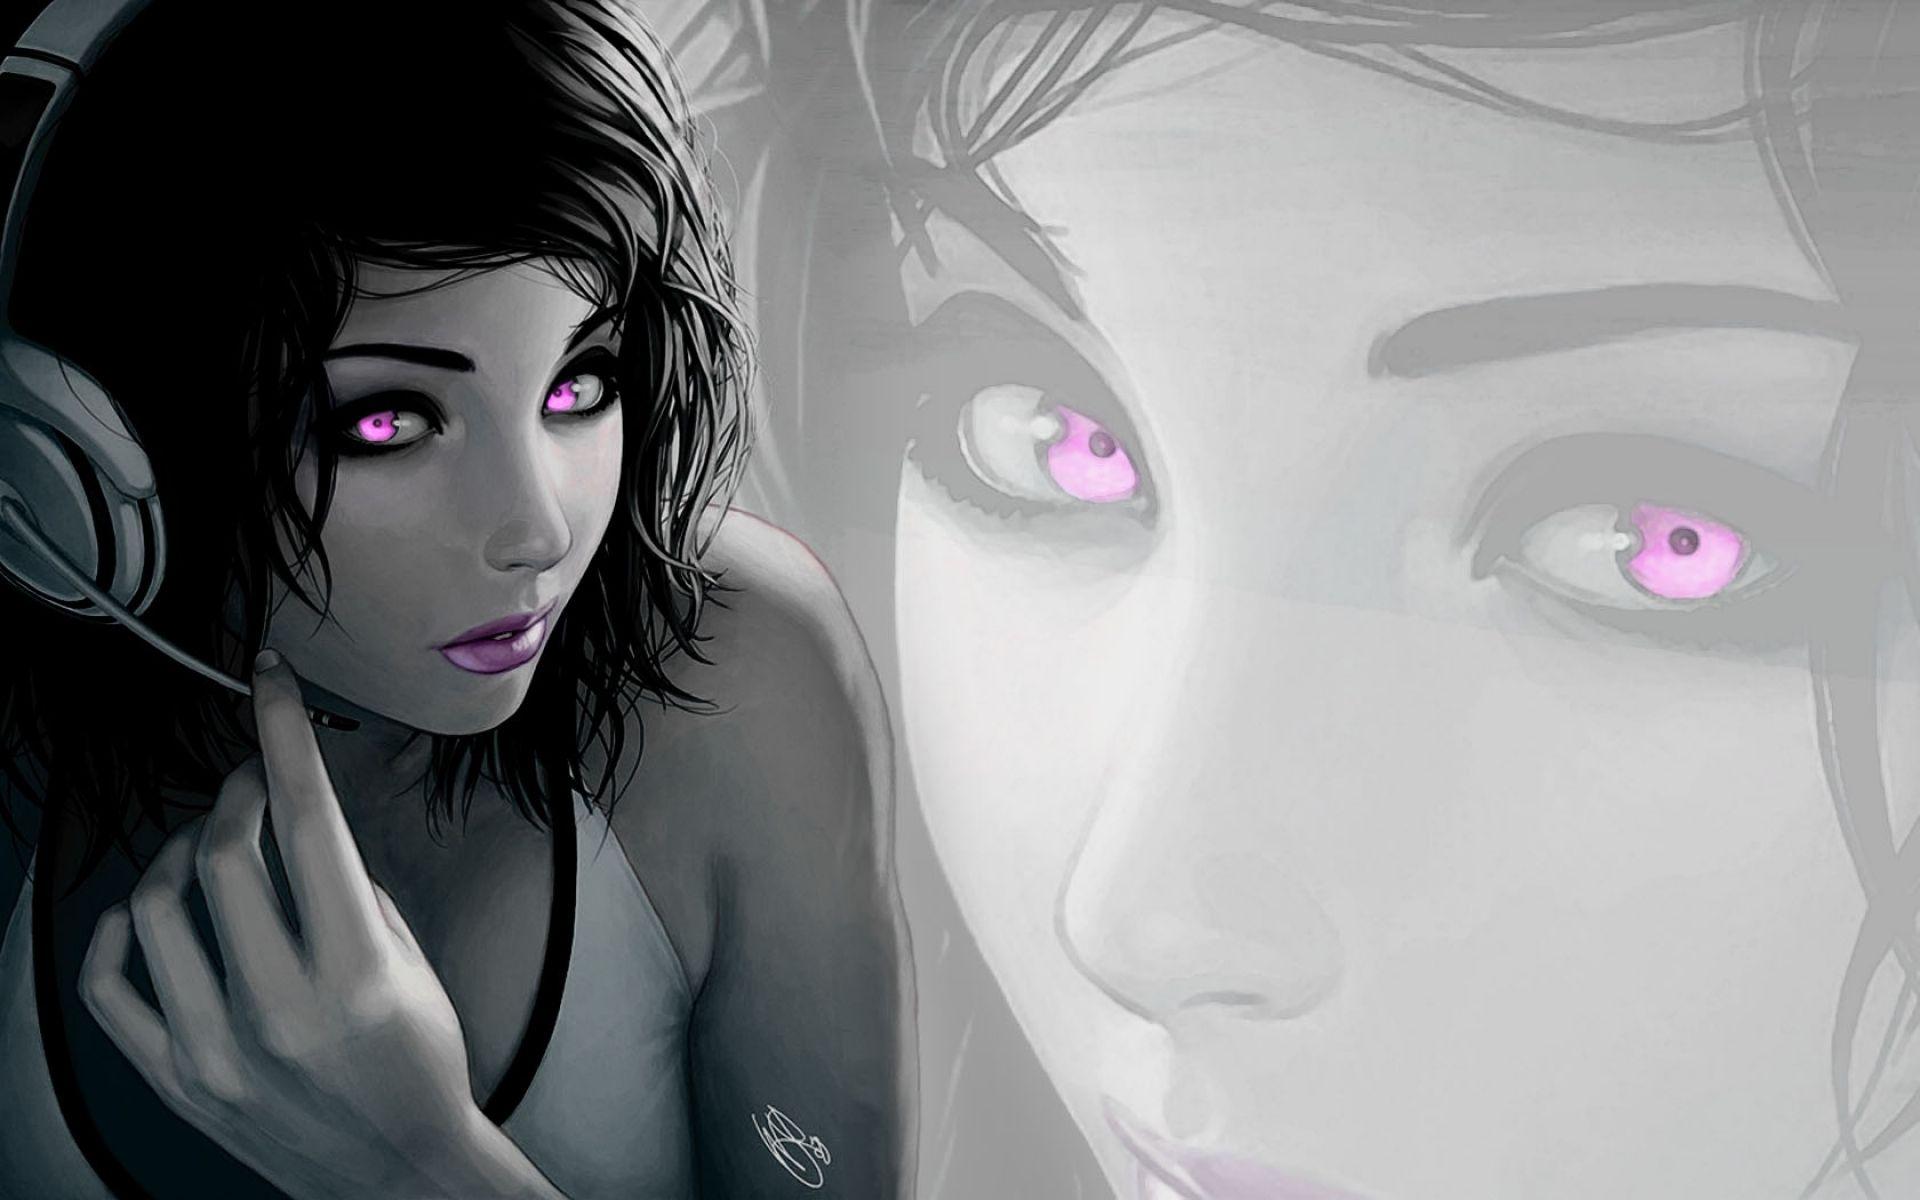 Headphones Brunettes Women Headphones Girl Lipstick Selective Coloring Purple Eyes 1680x1050 Wall High Quality Wallpaper